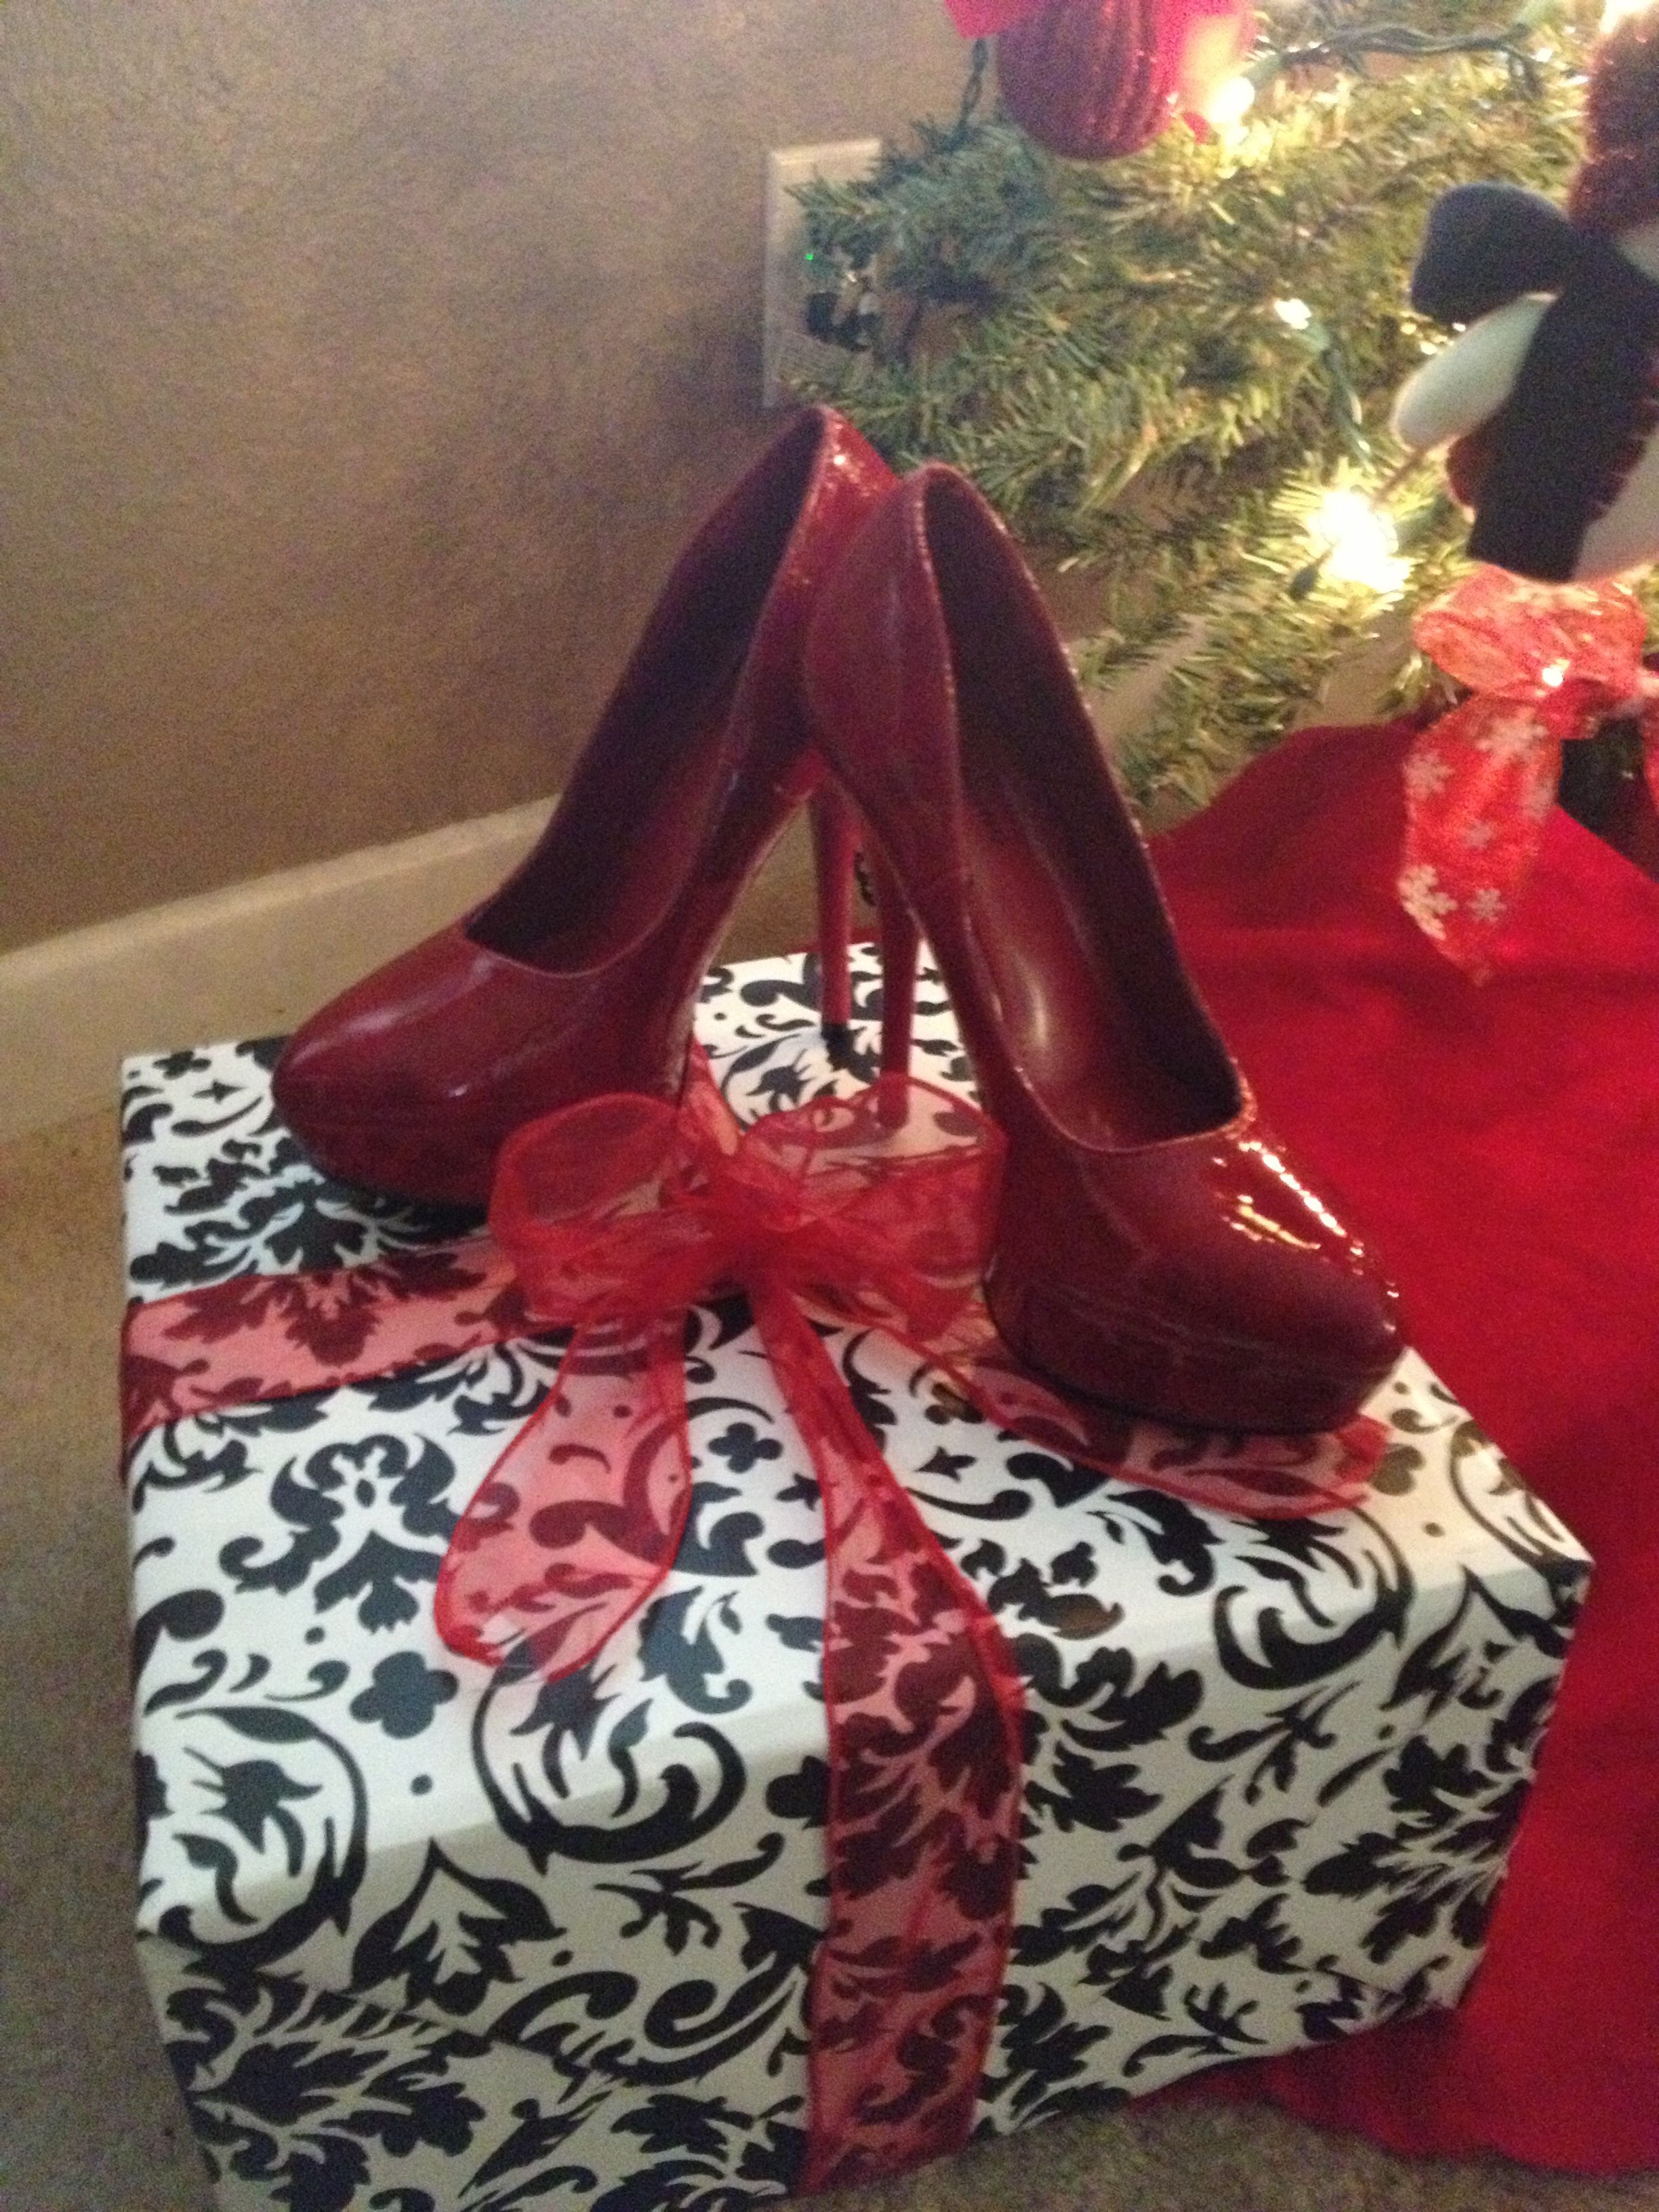 9e6a6ec33d652 Christmas red shoe decor | My Christmas | Decorated shoes, Christmas ...